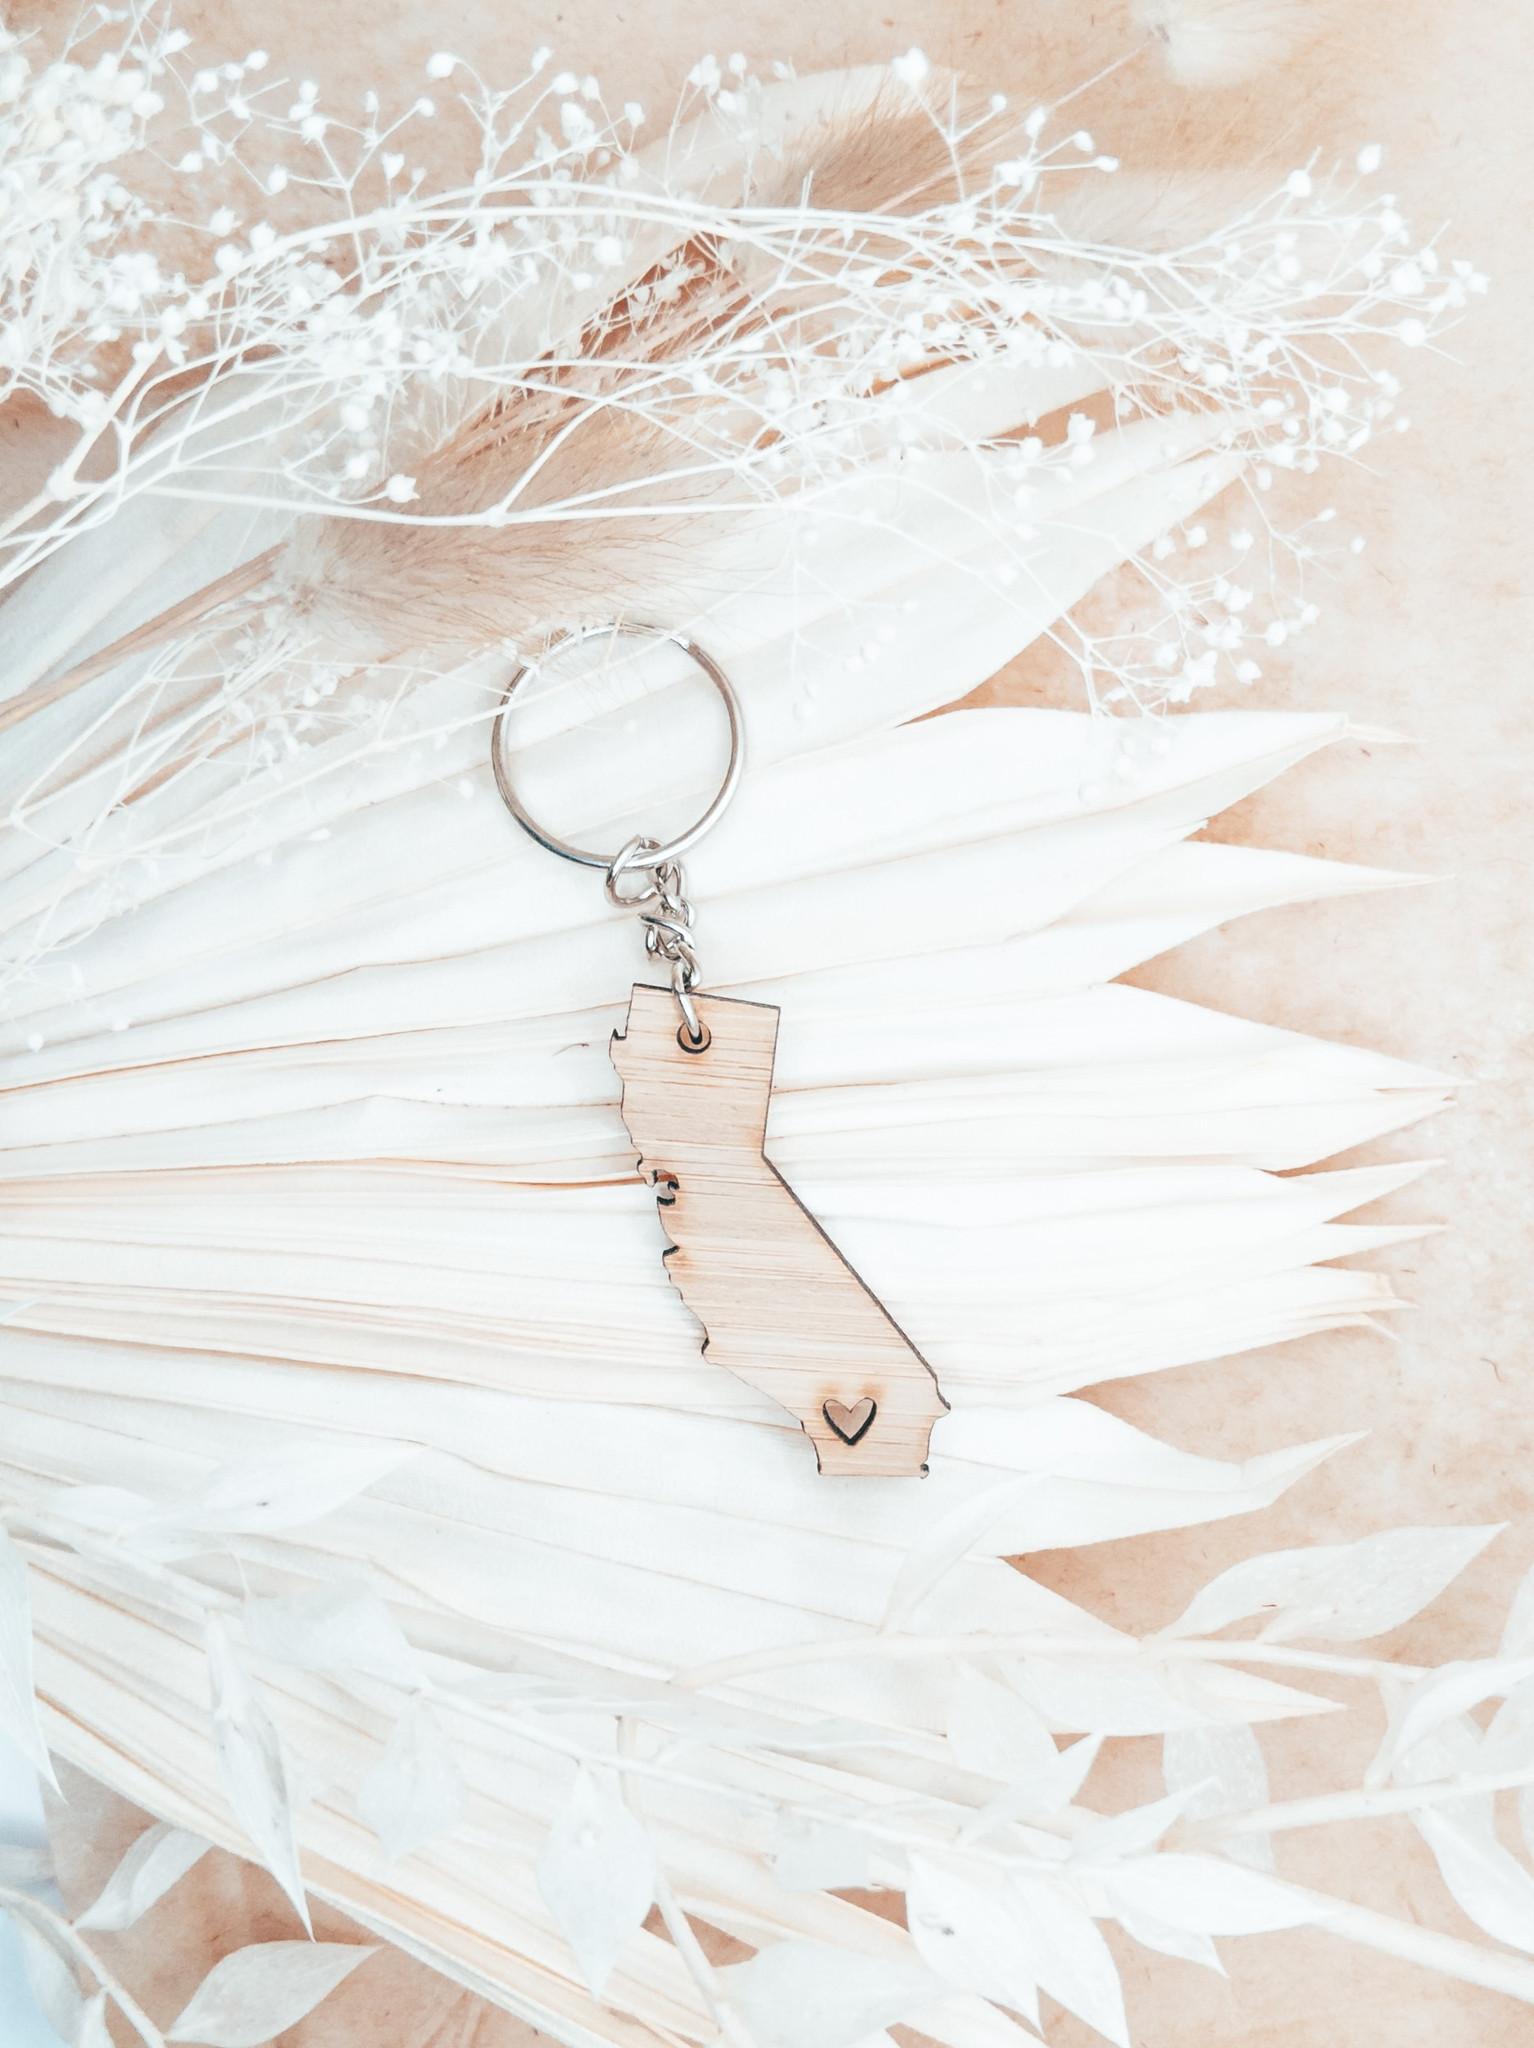 california handmade socal love keychain